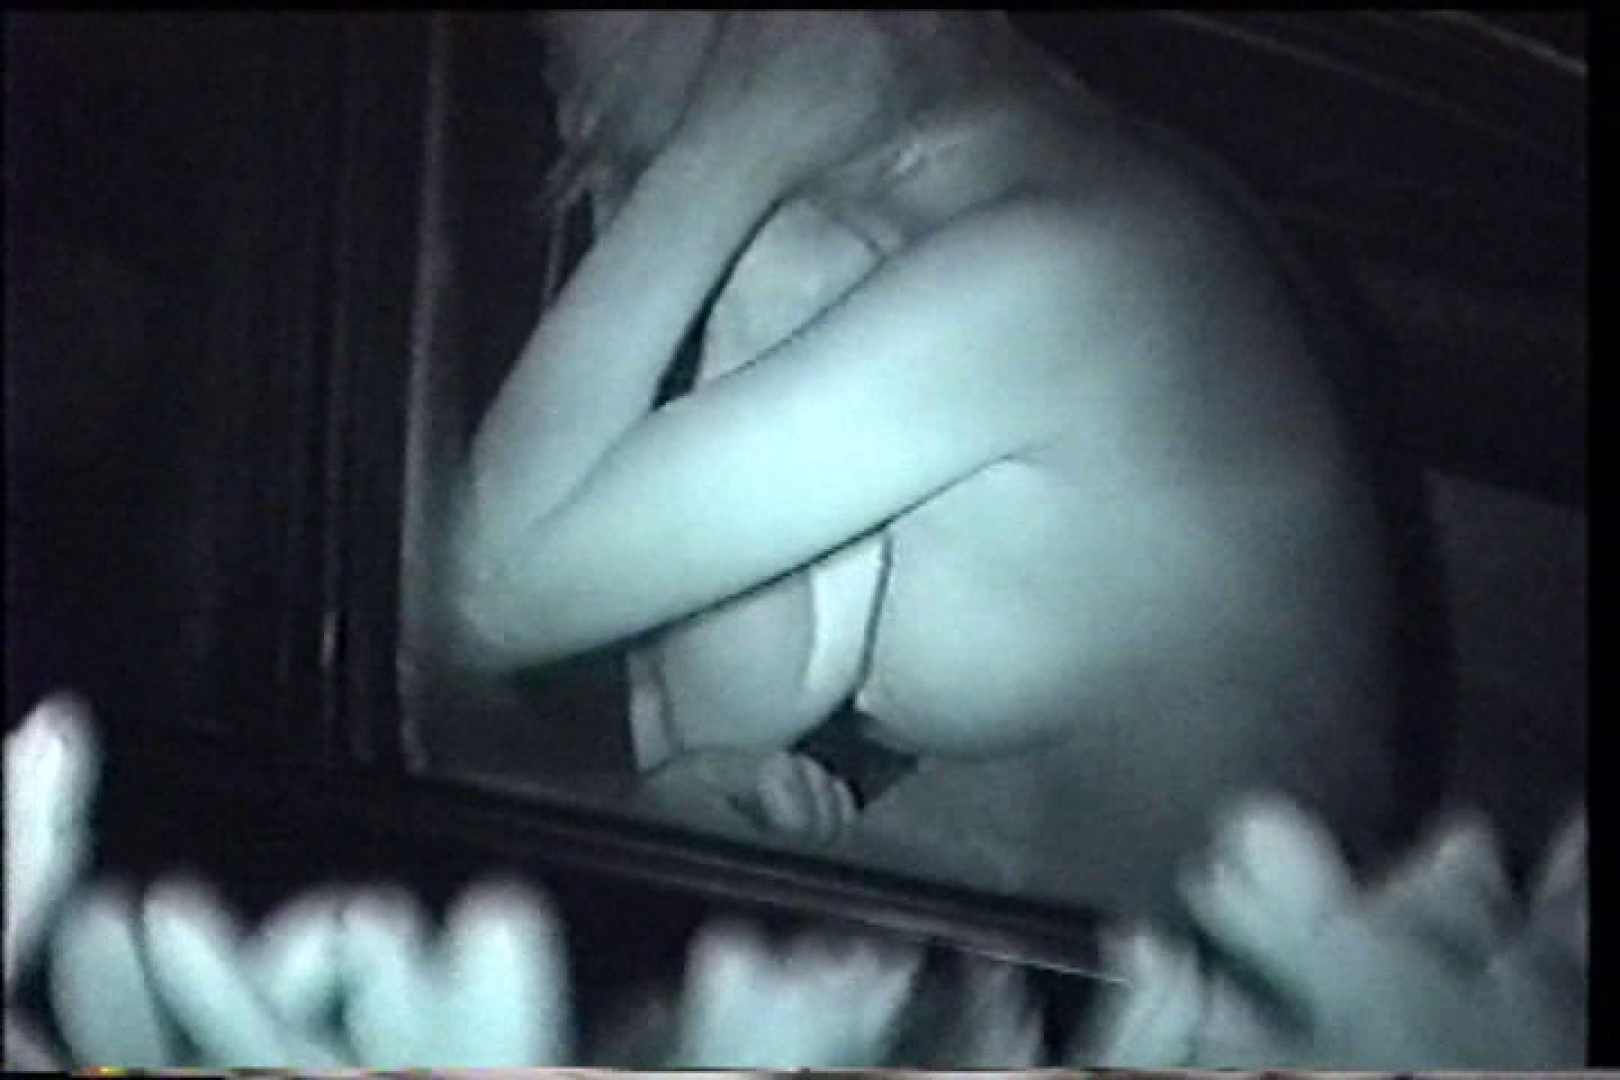 充血監督の深夜の運動会Vol.228 美乳  72PICs 51